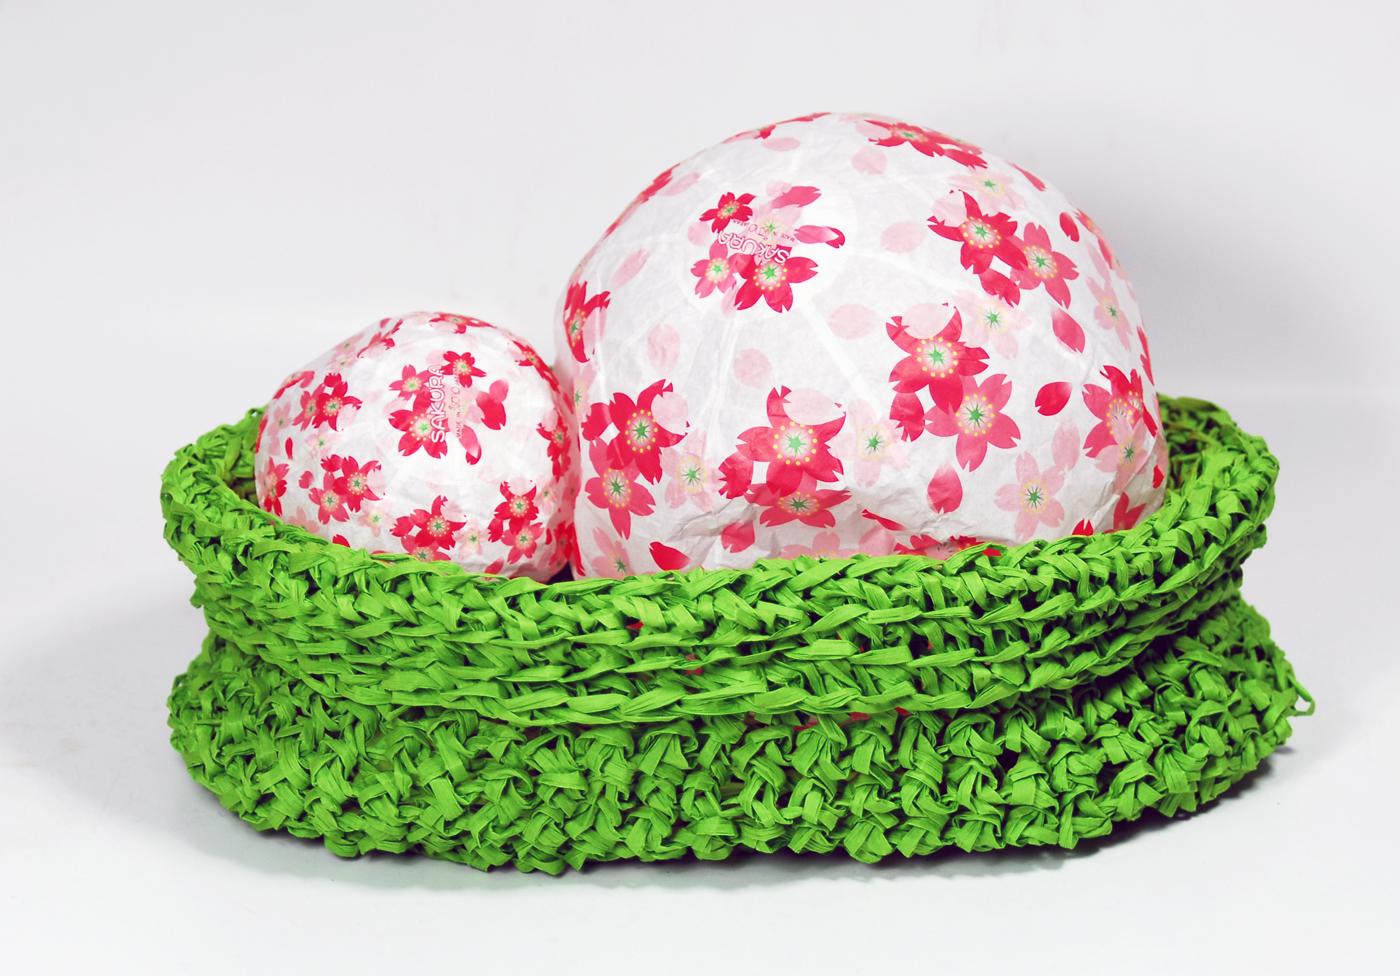 PaperPhine: Green Crochet Paper Raffia Basket